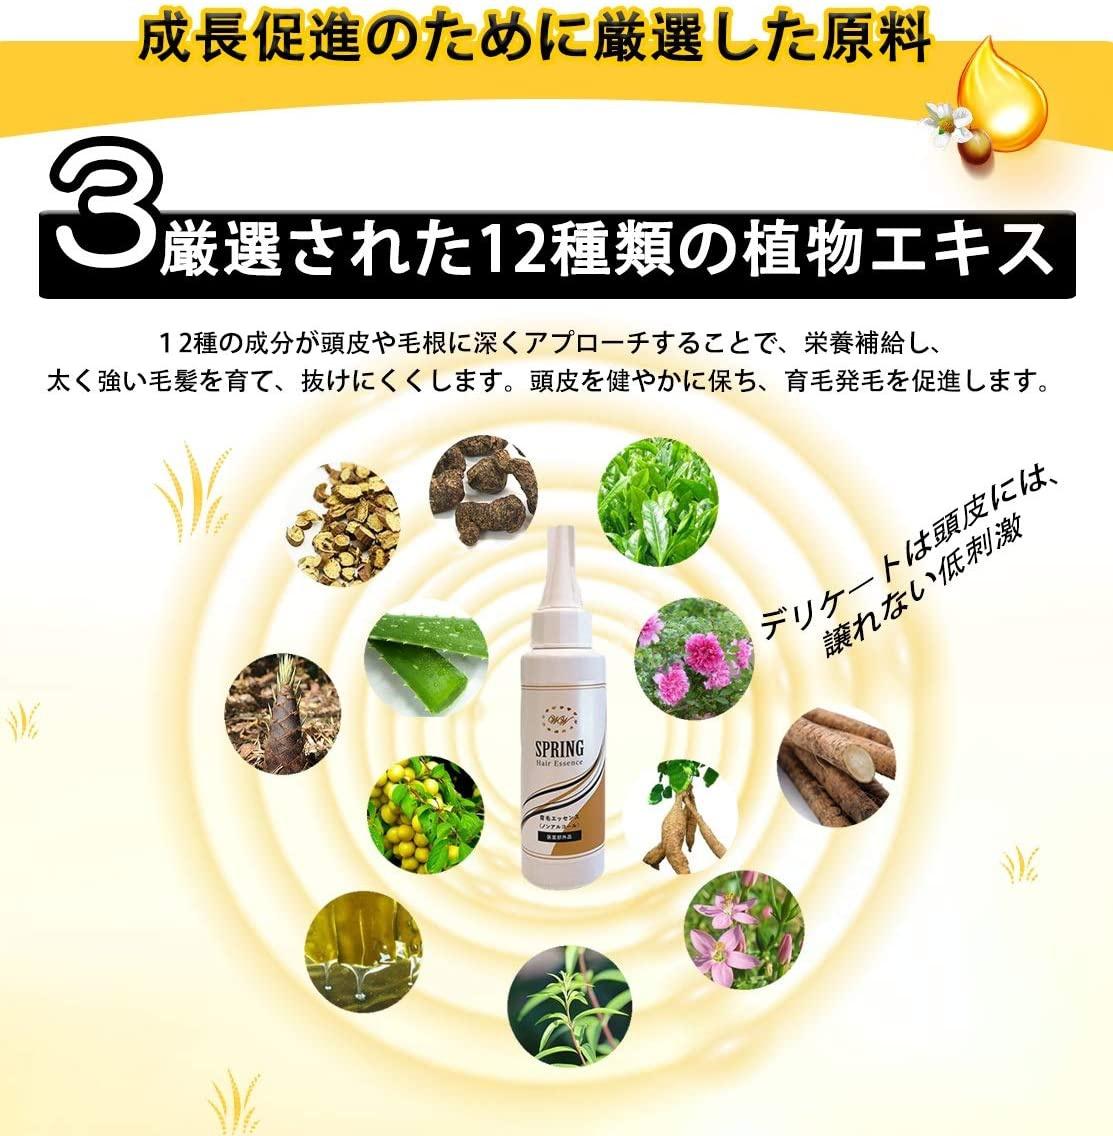 SPRING(スプリング) 薬用 育毛 エッセンスの商品画像7